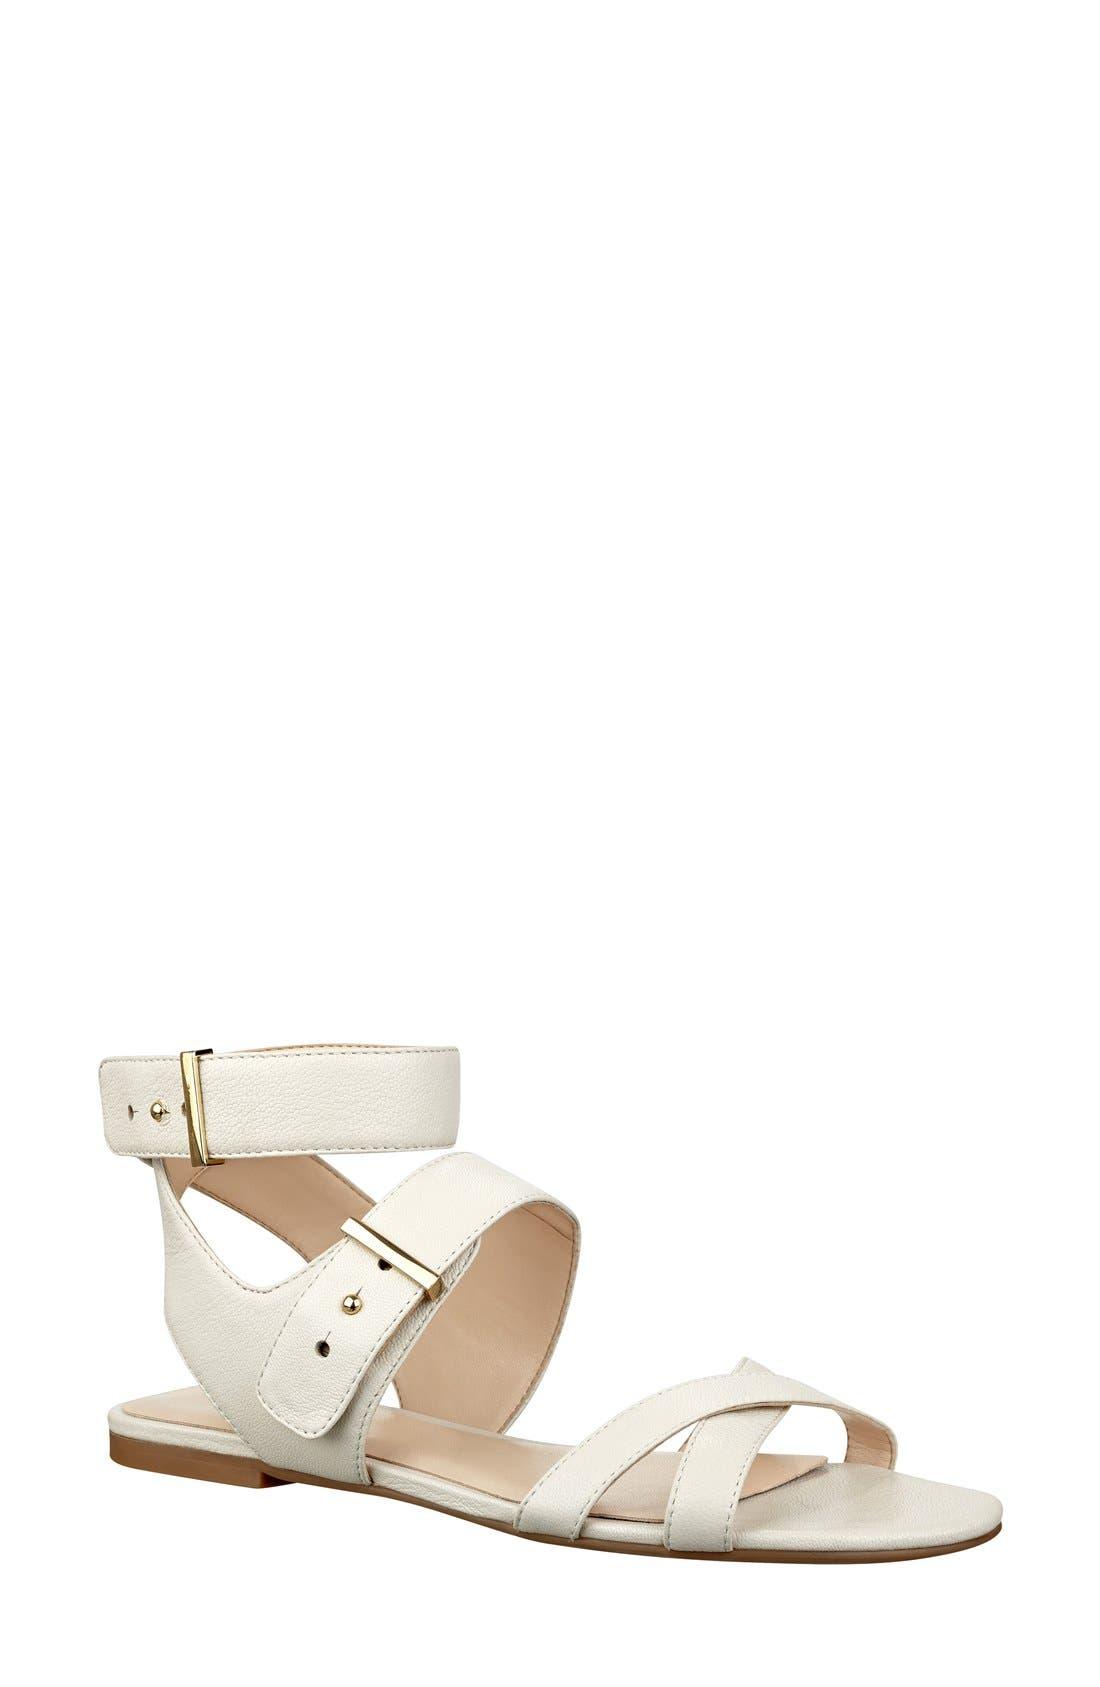 Main Image - Nine West 'Darcelle' Flat Sandal (Women)